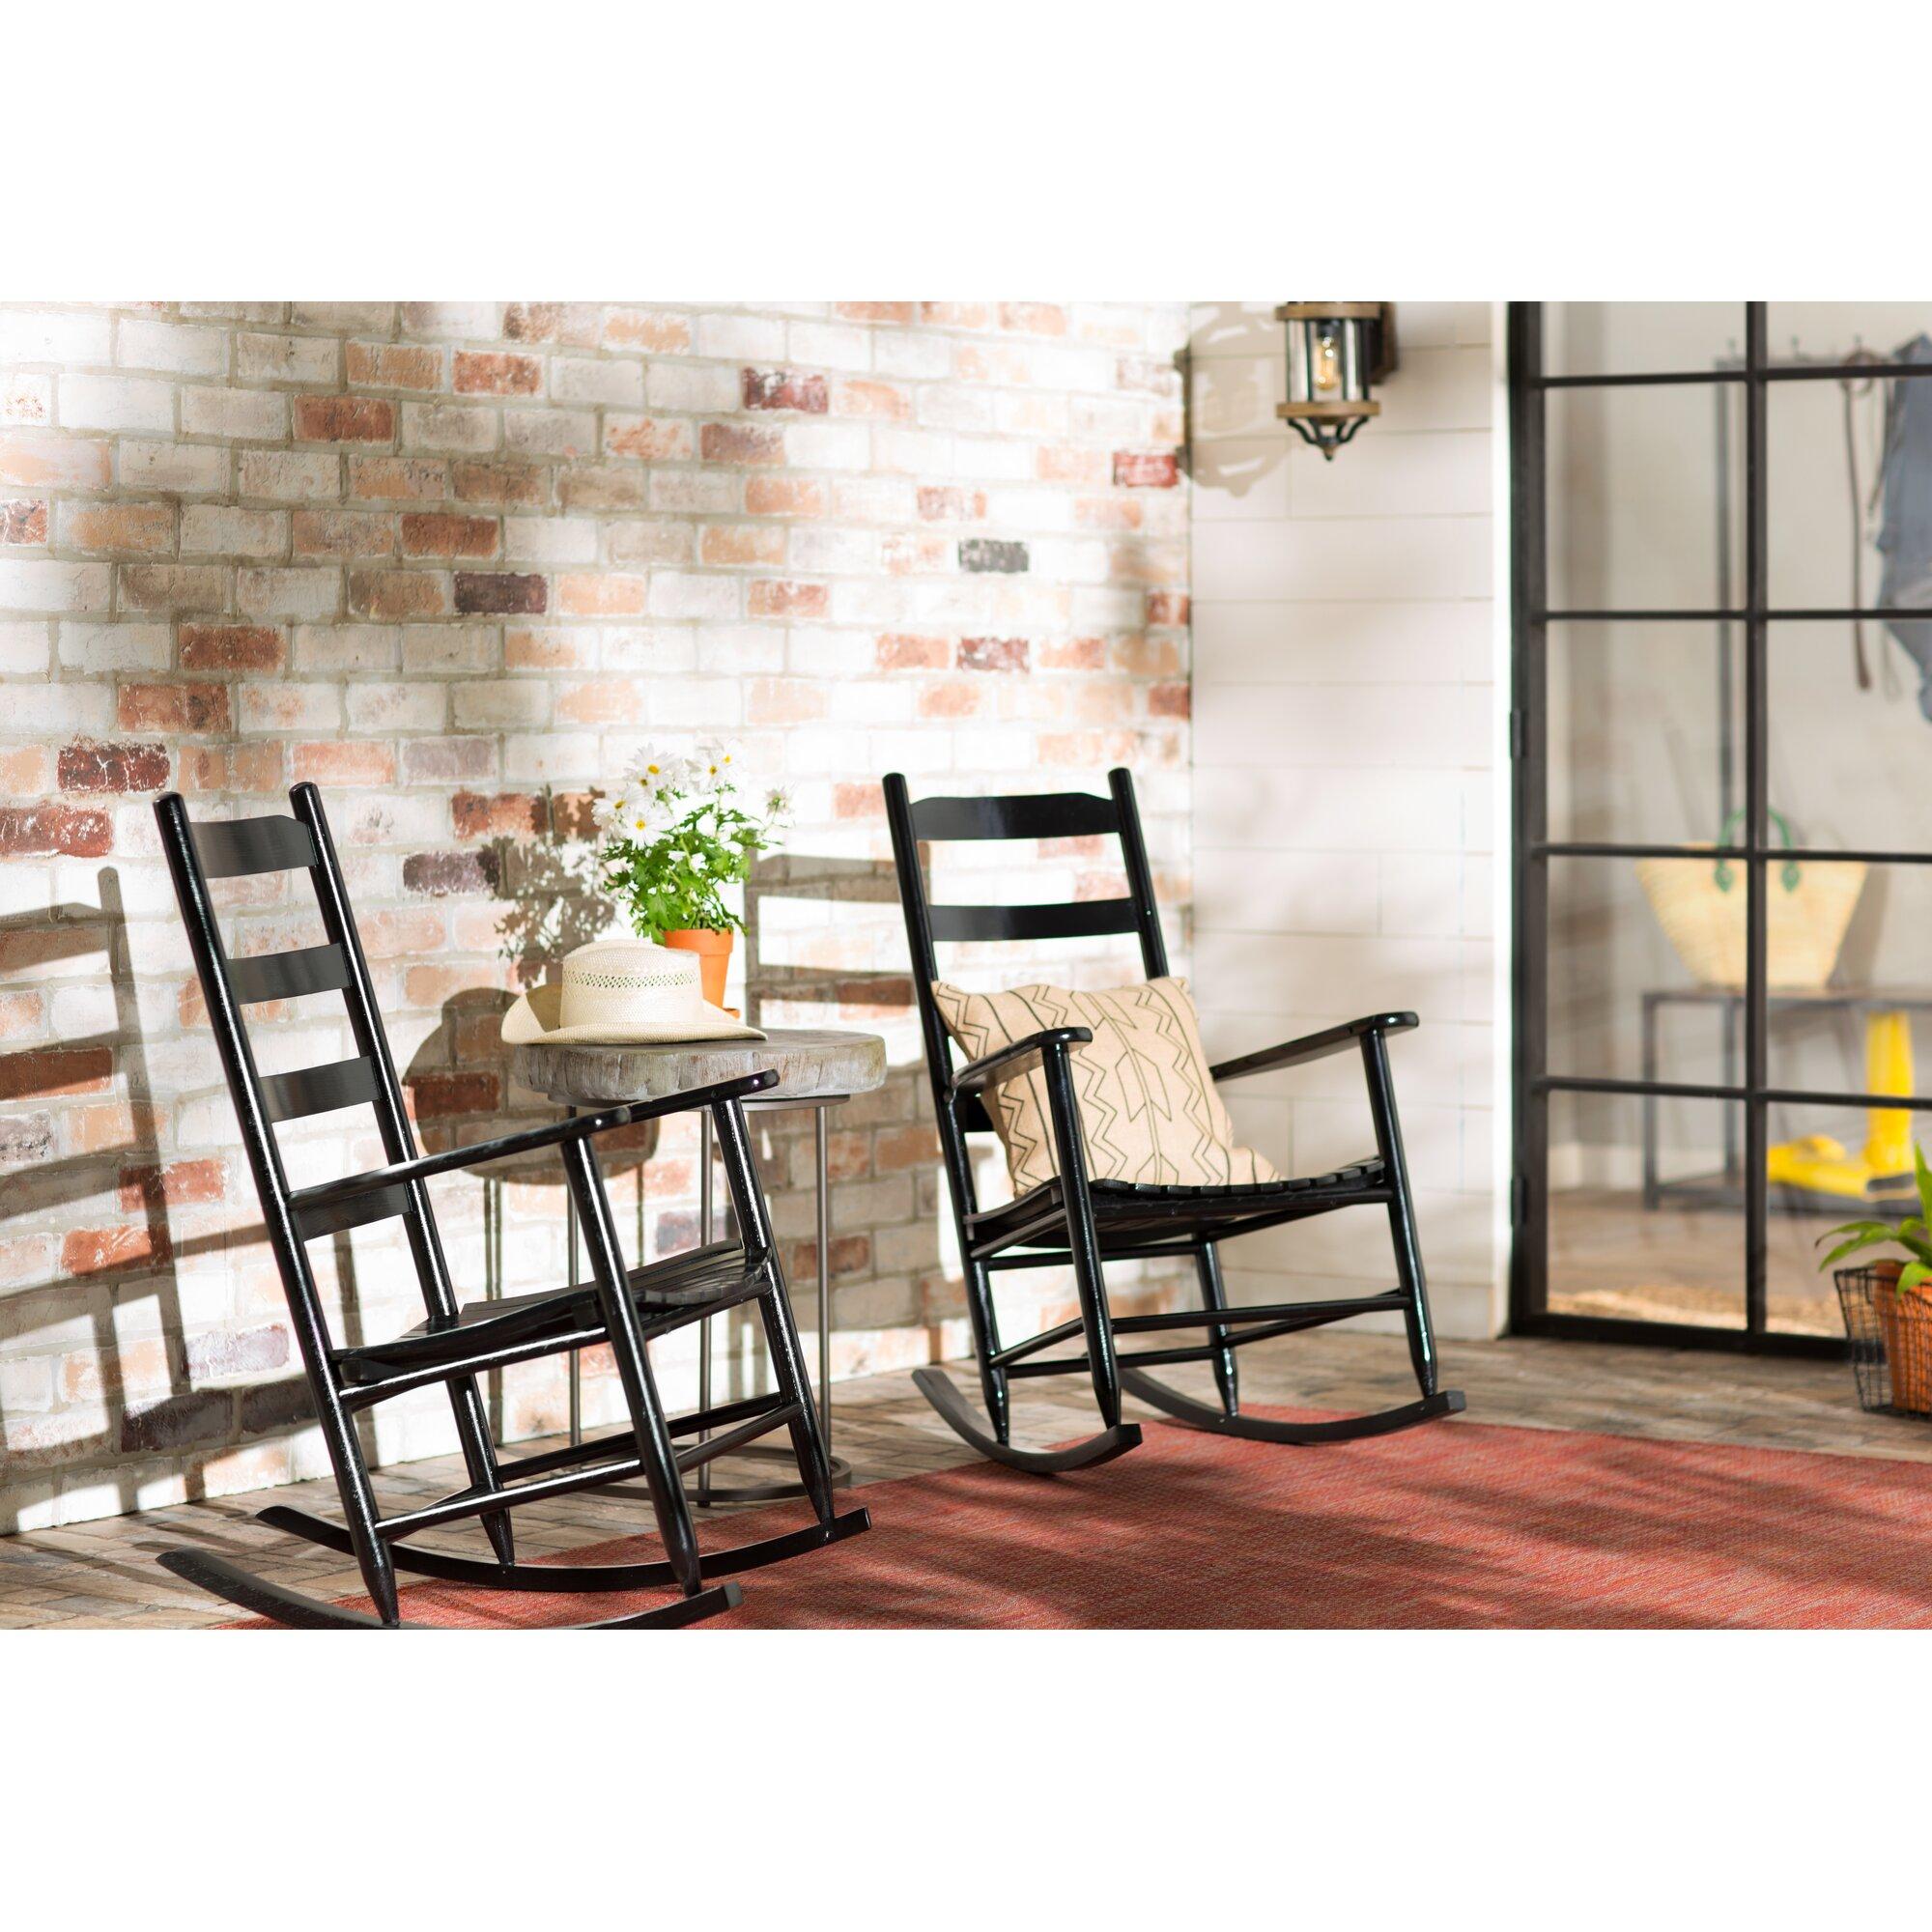 ... Modern Farmhouse Ona Ladder Back Rocking Chair & Reviews  Wayfair